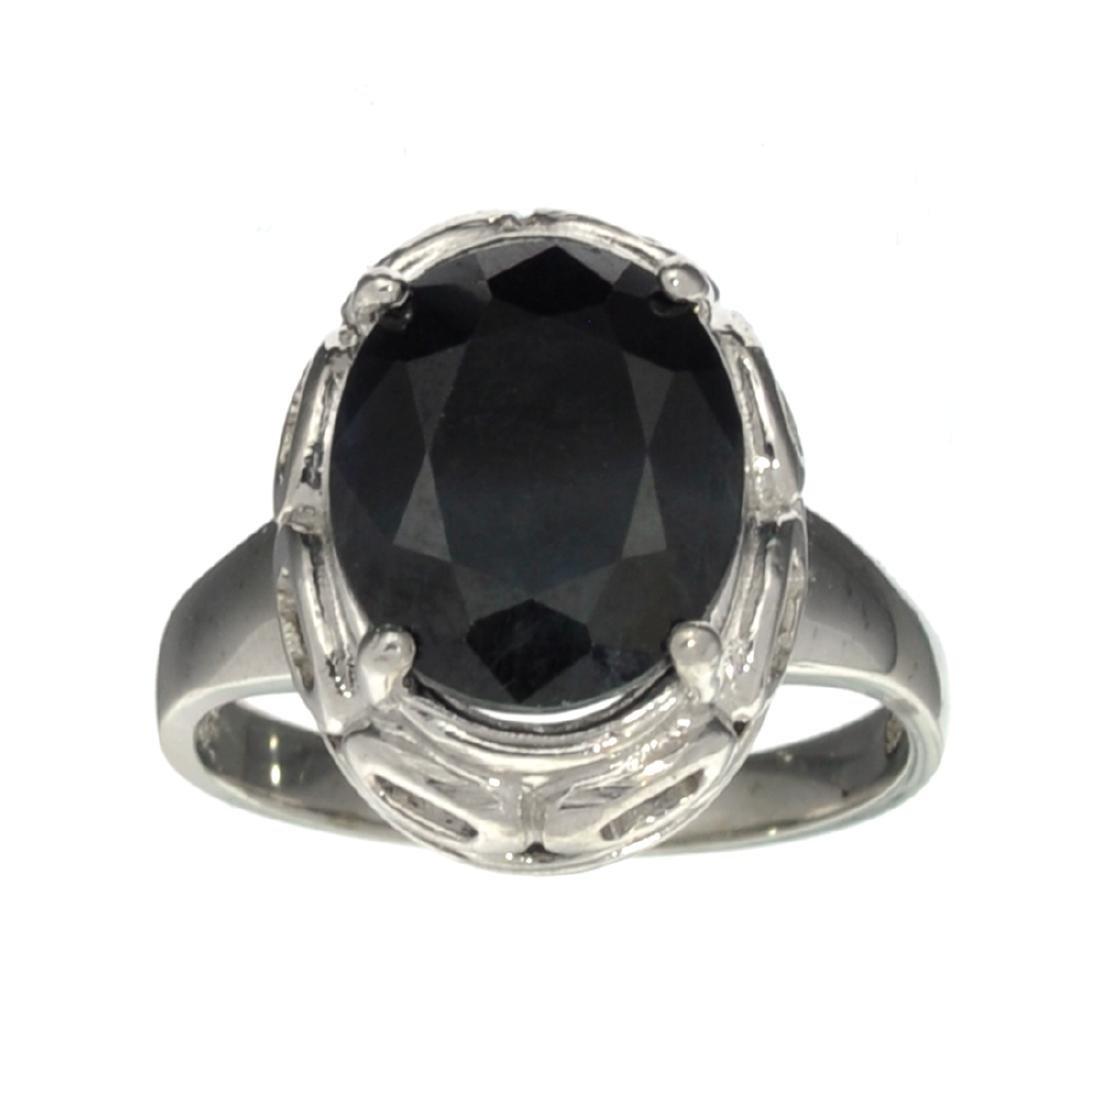 APP: 1.1k Fine Jewelry Designer Sebastian, 5.15CT Oval